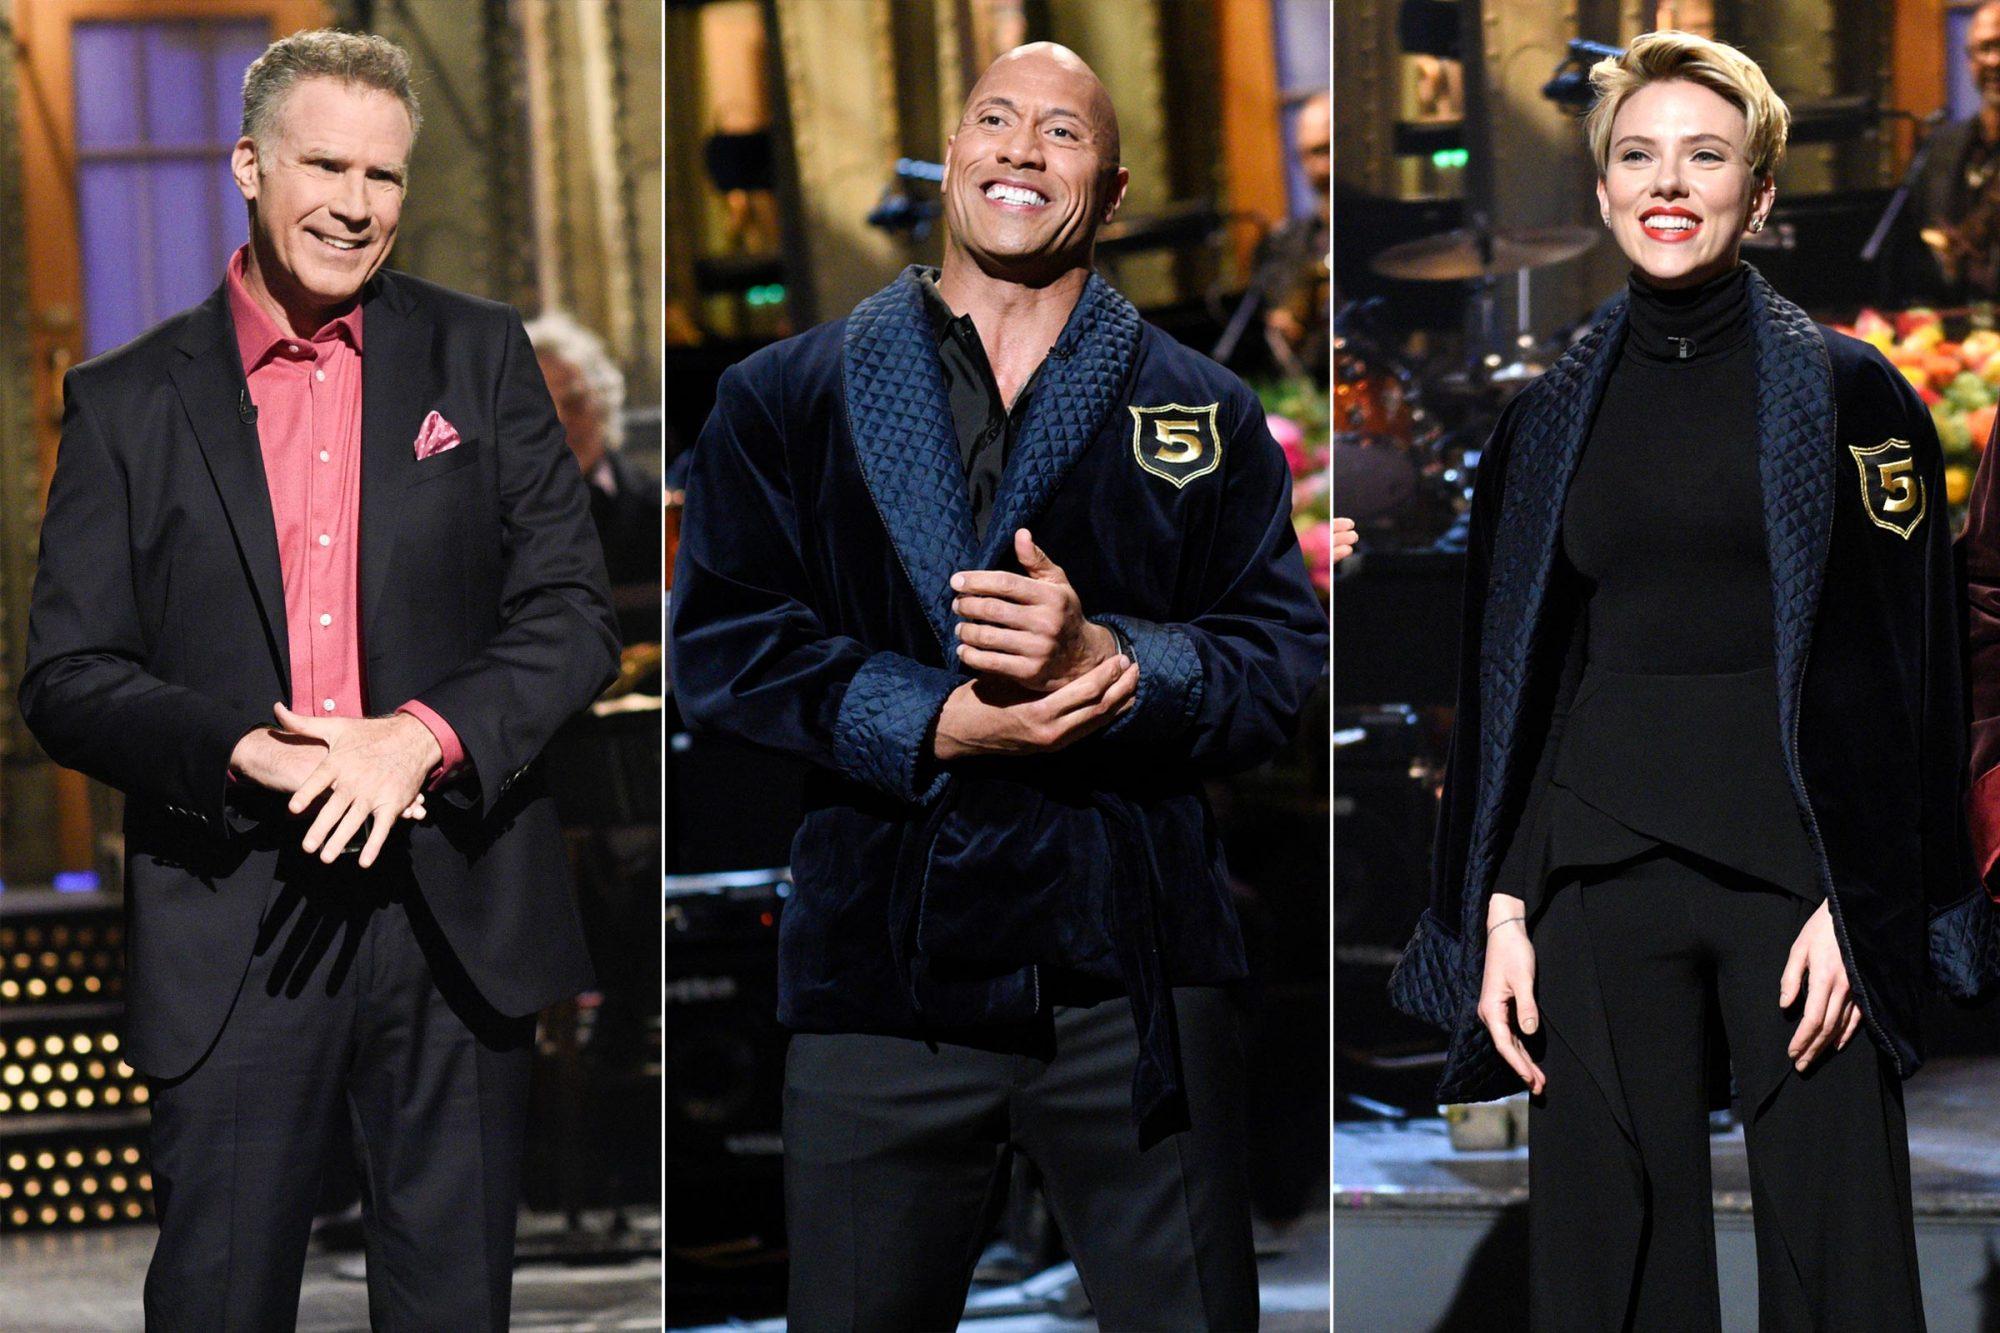 Will Ferrell / Dwayne Johnson / Scarlett Johansson